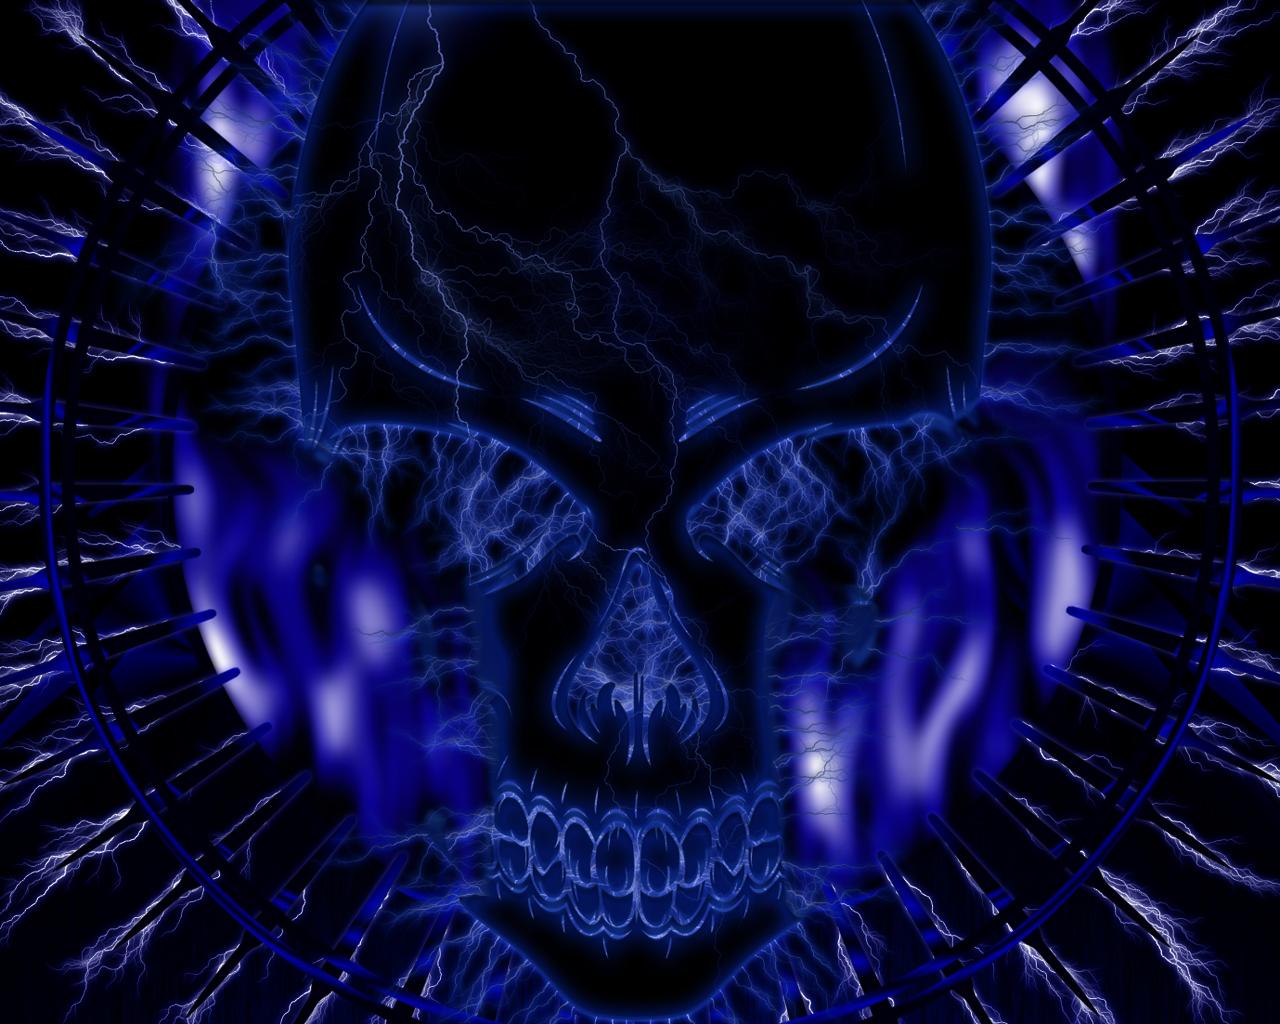 Incredible Neon Skull Wallpaper: Blue Skull Wallpaper